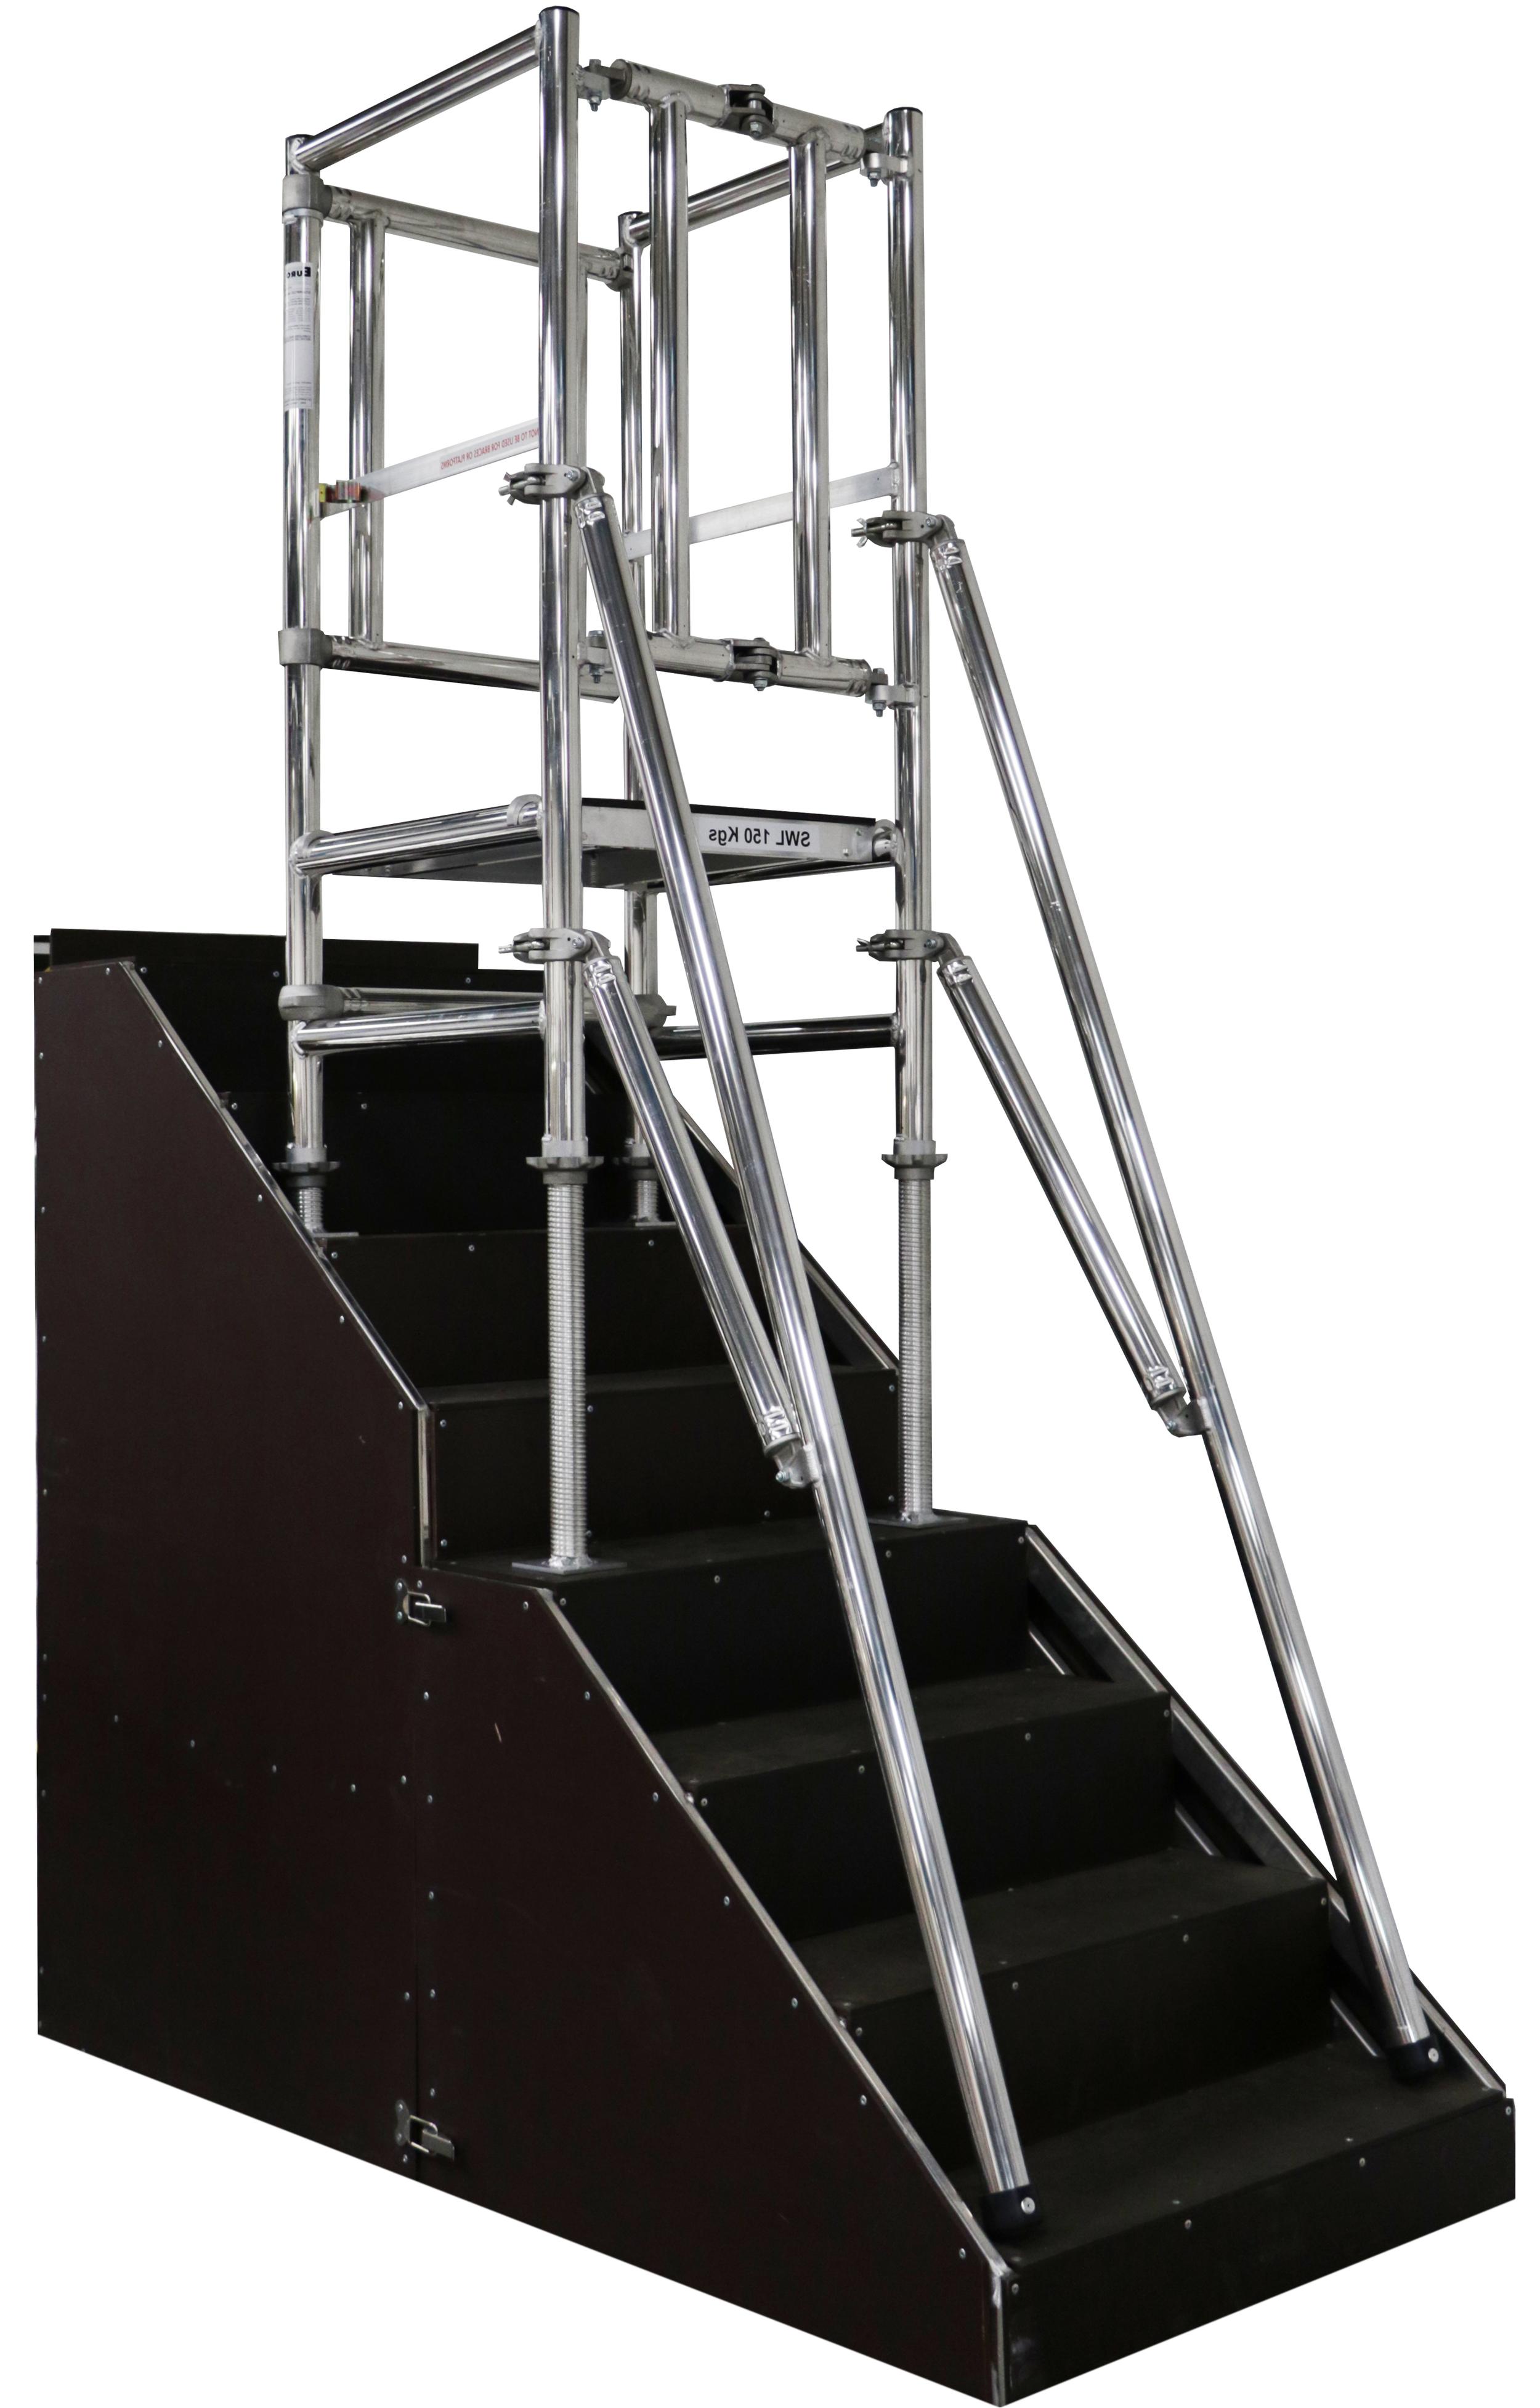 Stairpod 500, stair access, Aluminium access tower system, Euro Towers, aluminium podium